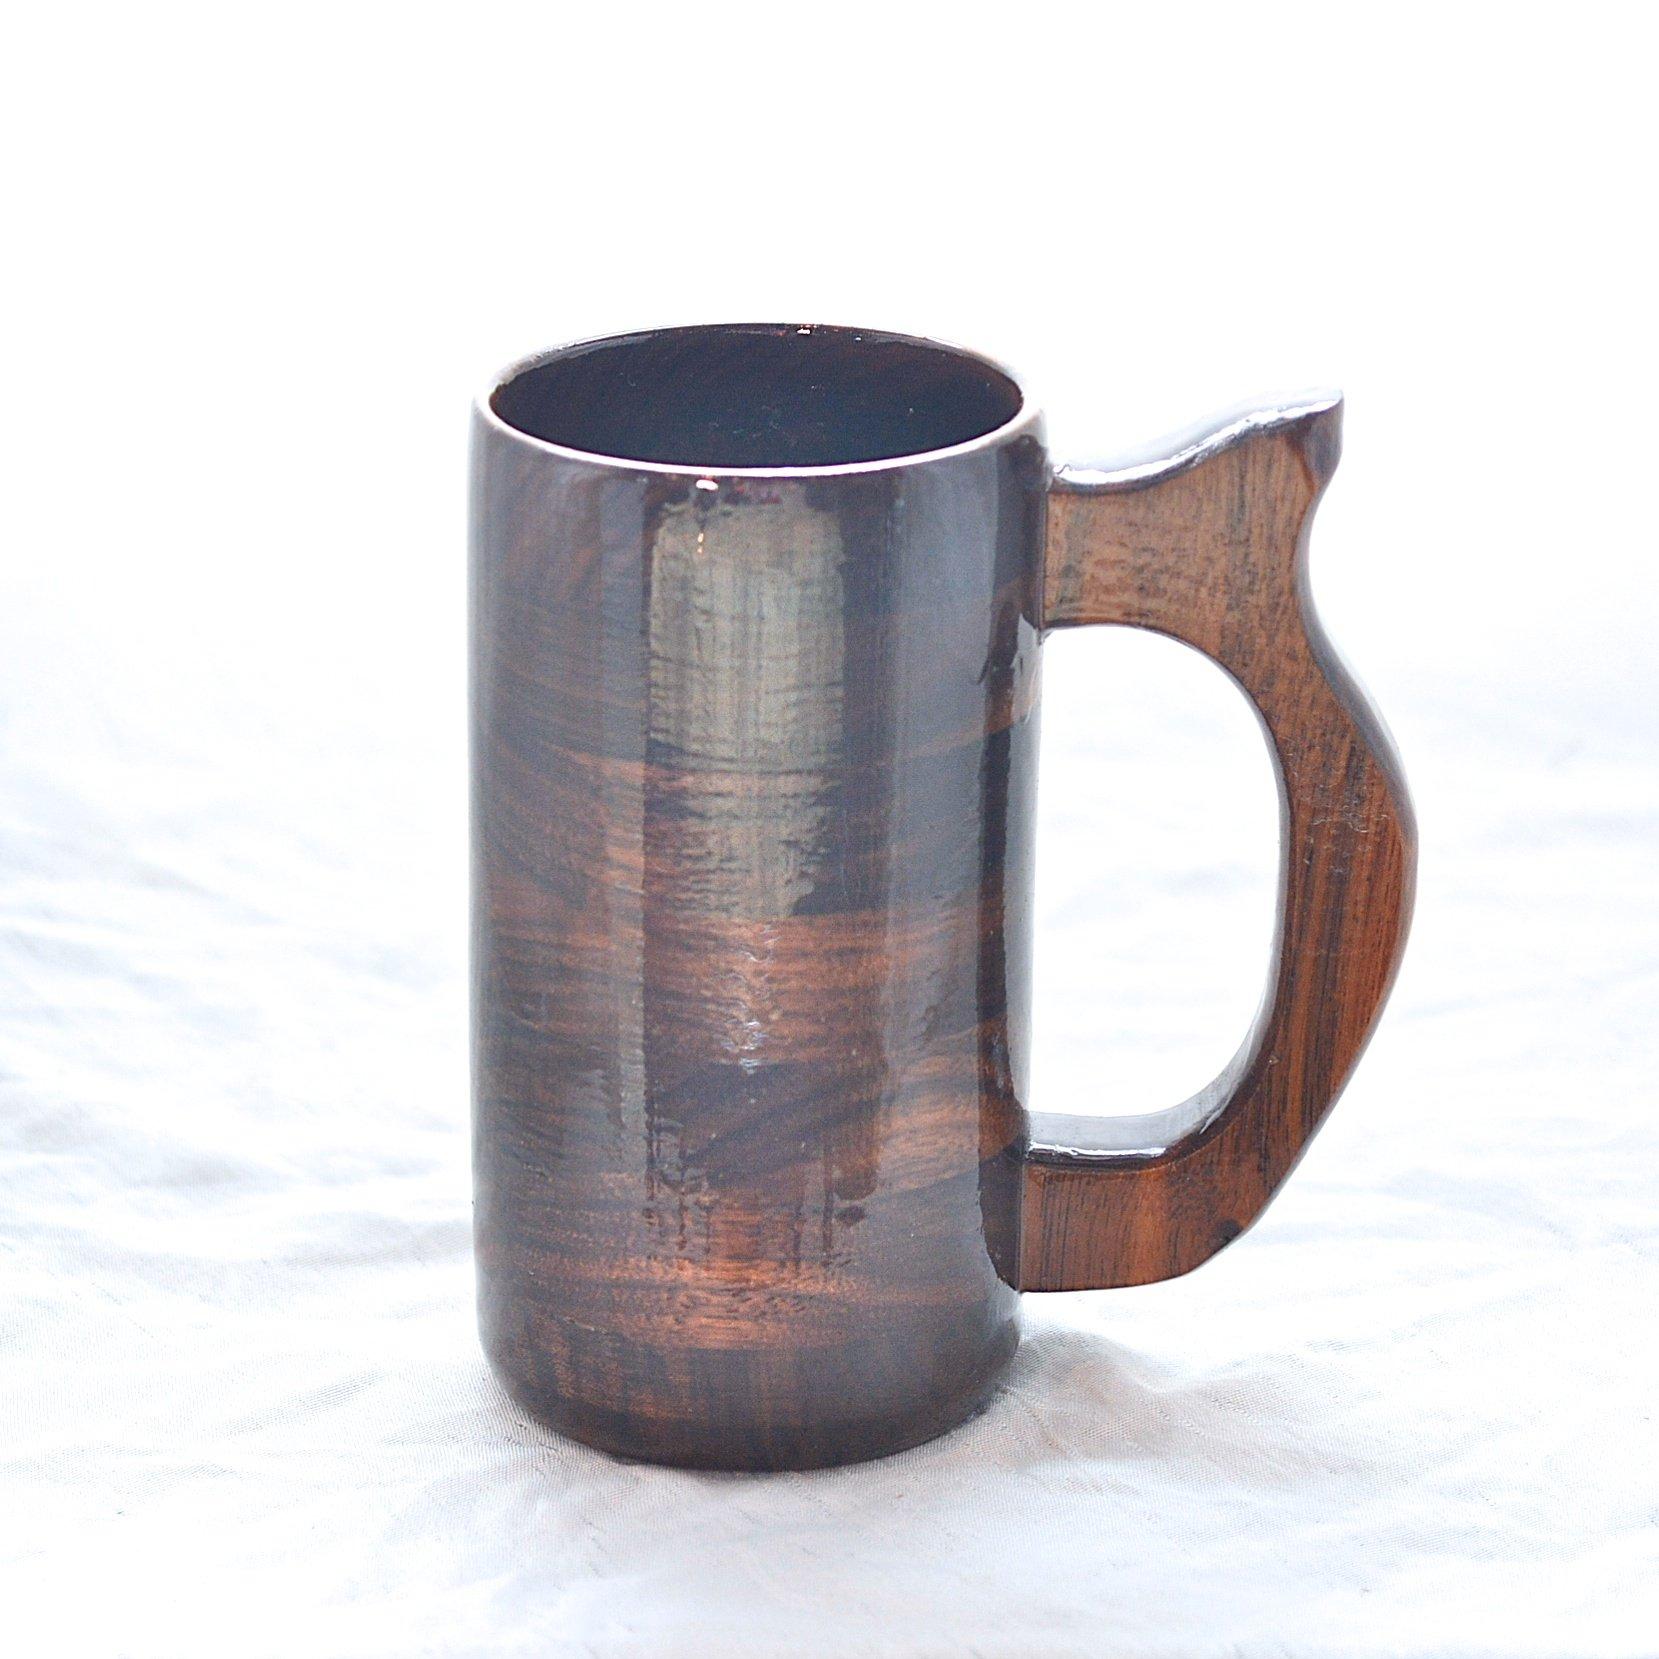 12 Ounce Wooden Walnut Beer Stein, Wood Coffee Mug, Renaissance Festival Stein